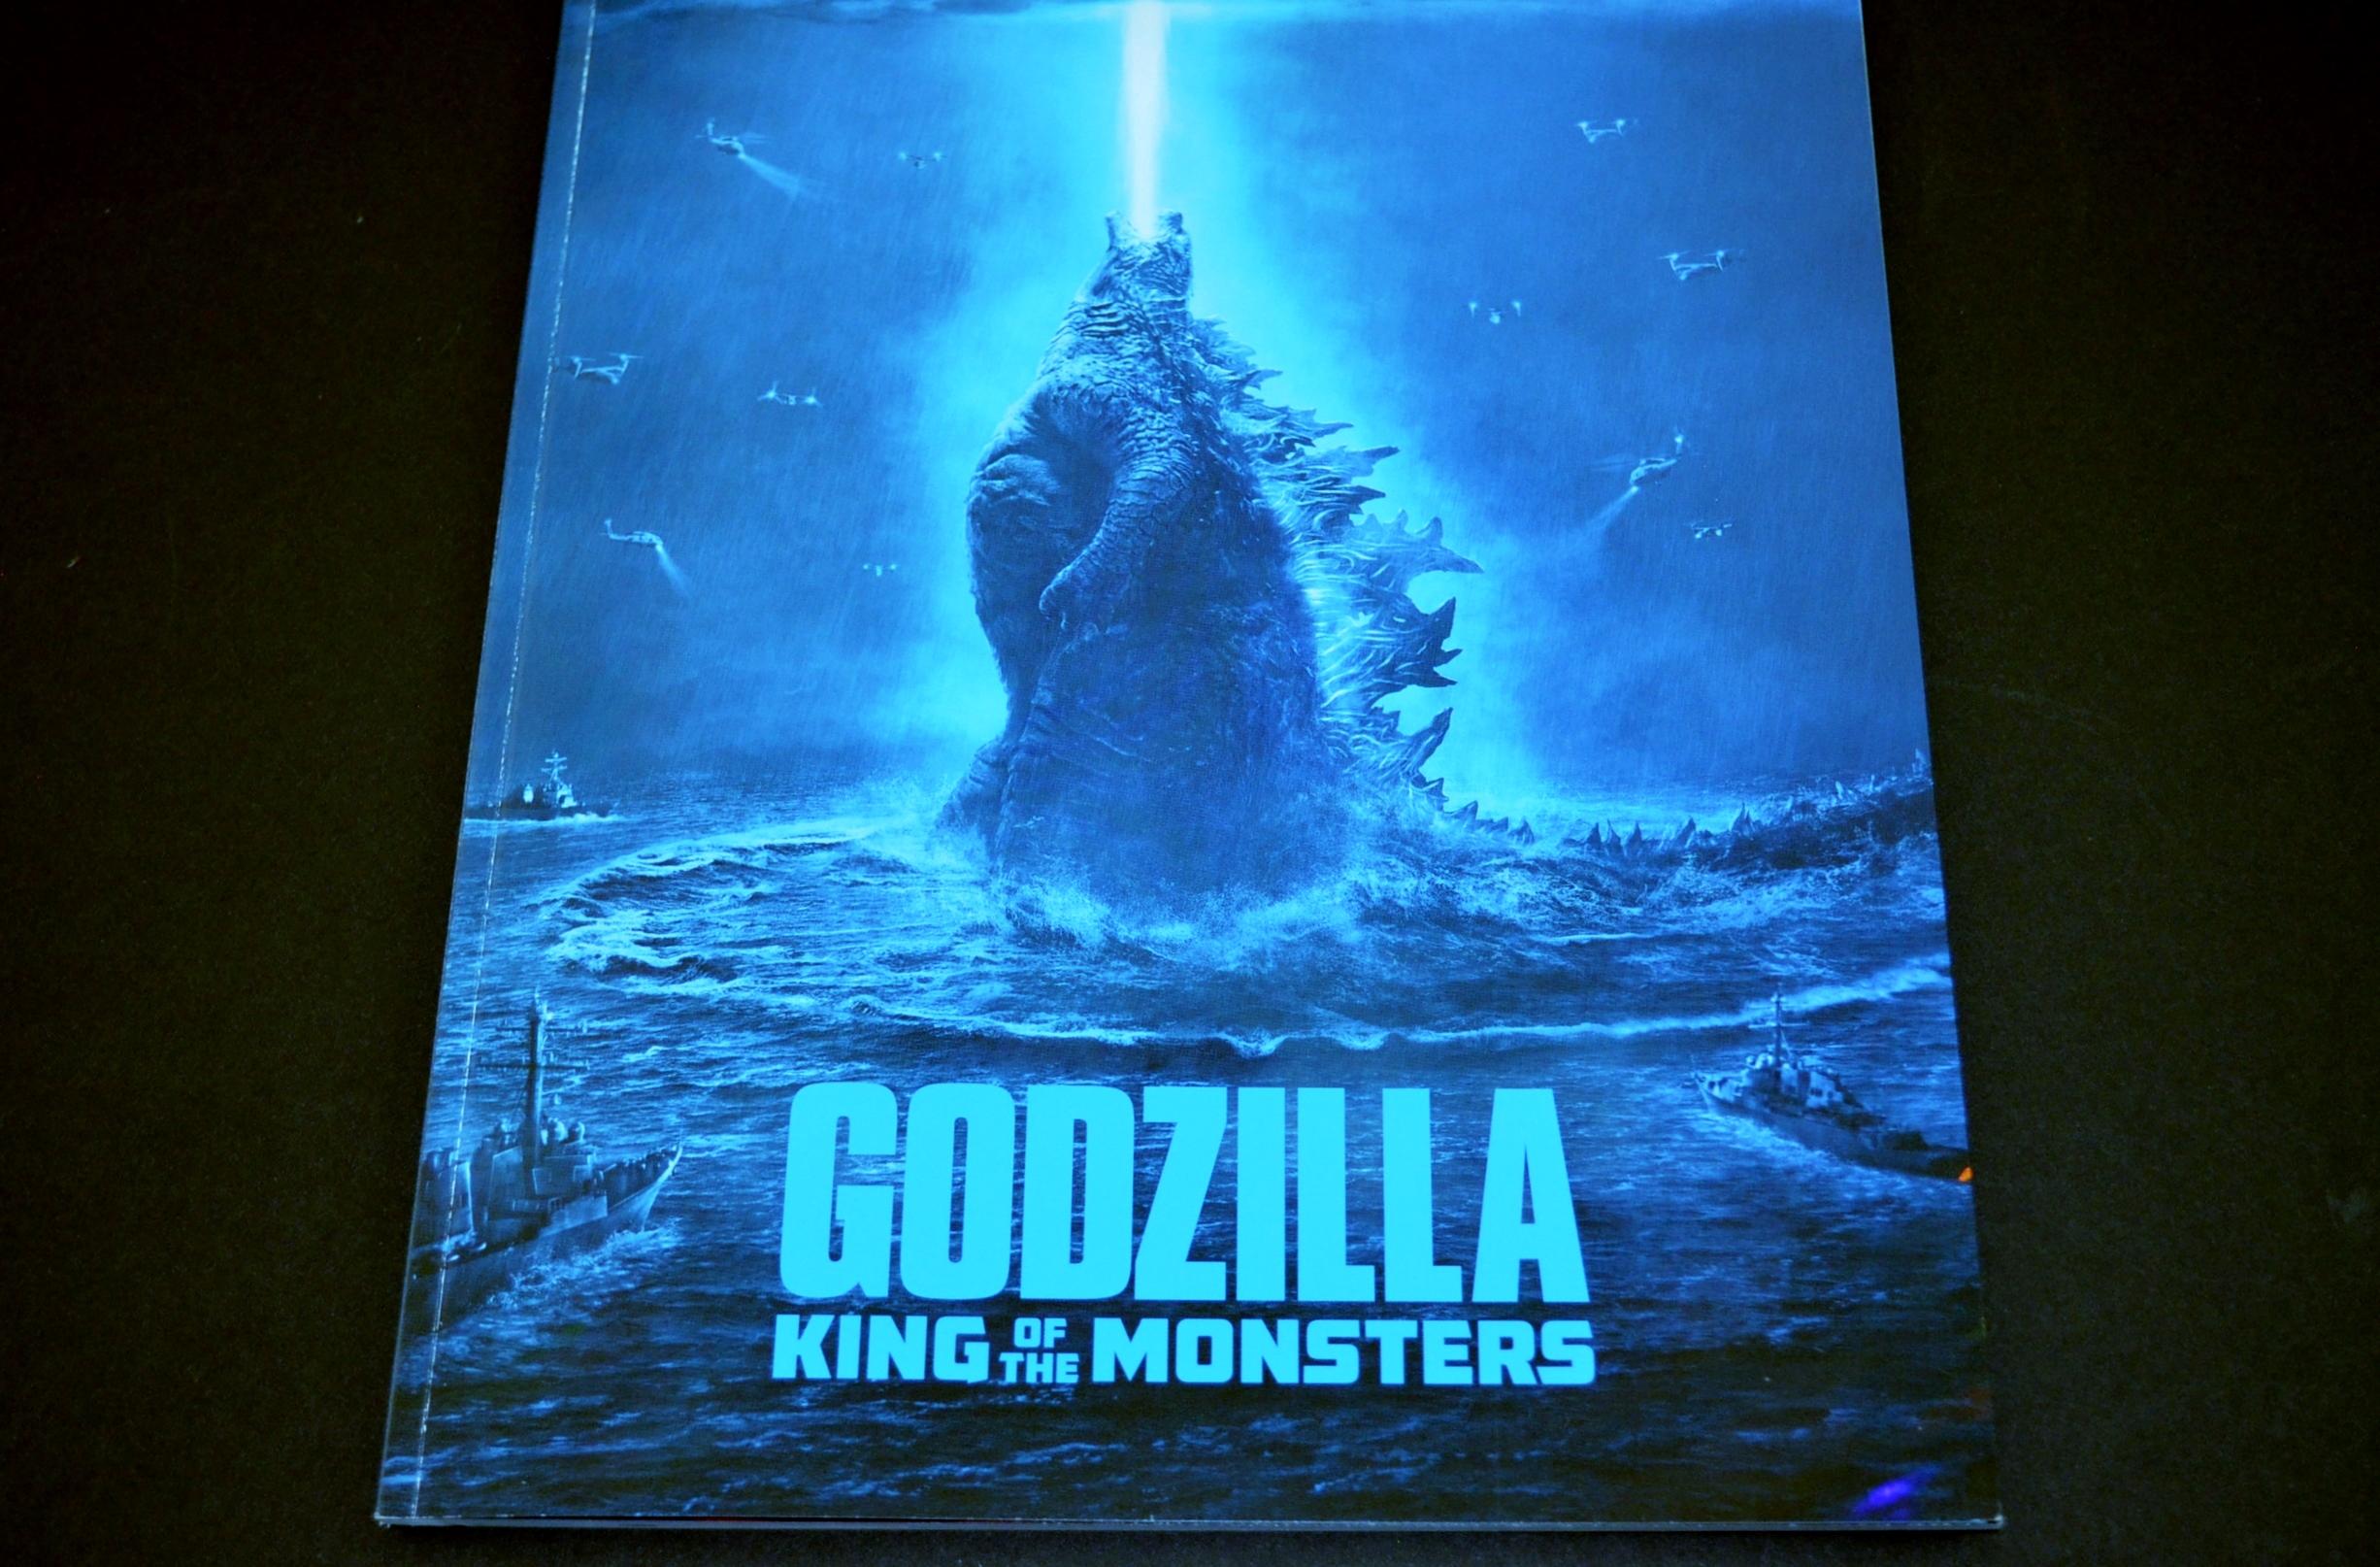 Godzilla King Of Monsters 2019 Movie Program Japan Clawmark Toys